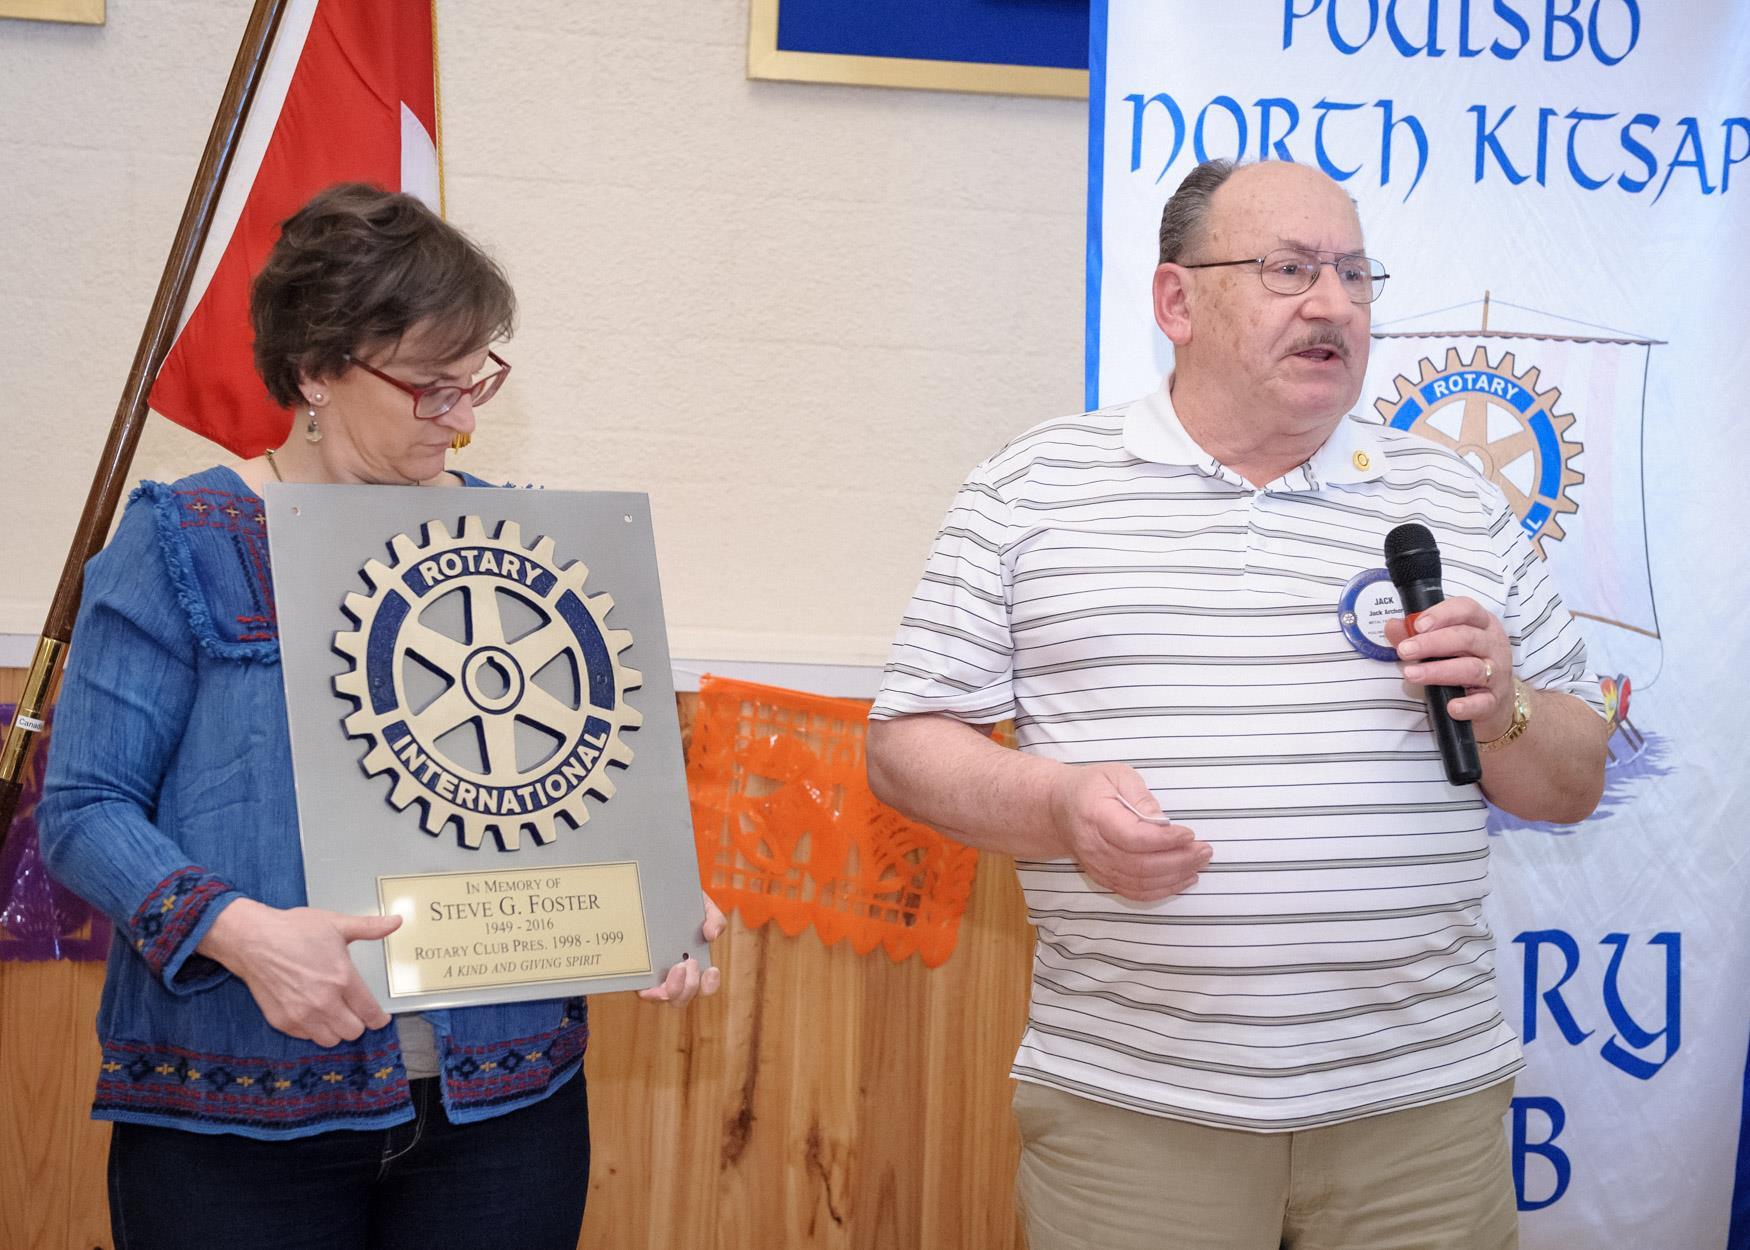 Jack Archer presents the Memorial Plaque for Steve Foster